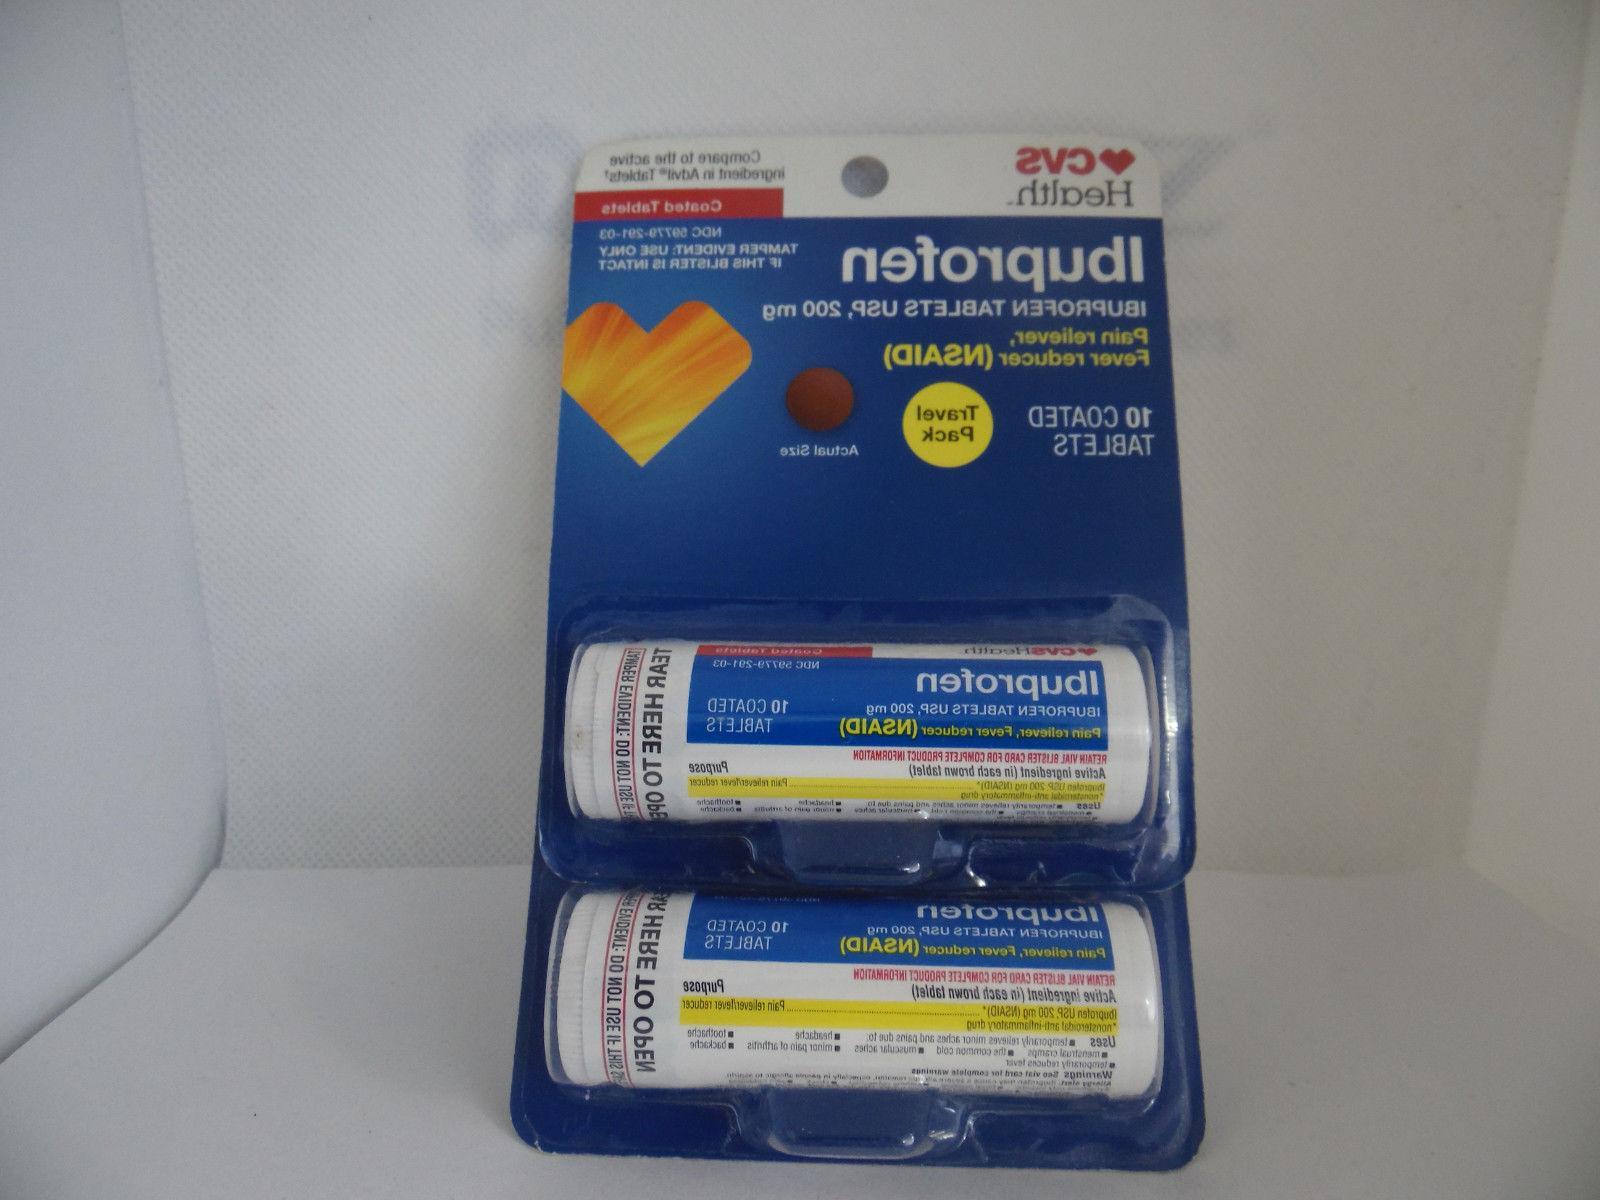 2 health ibuprofen 10 coated tablets travel